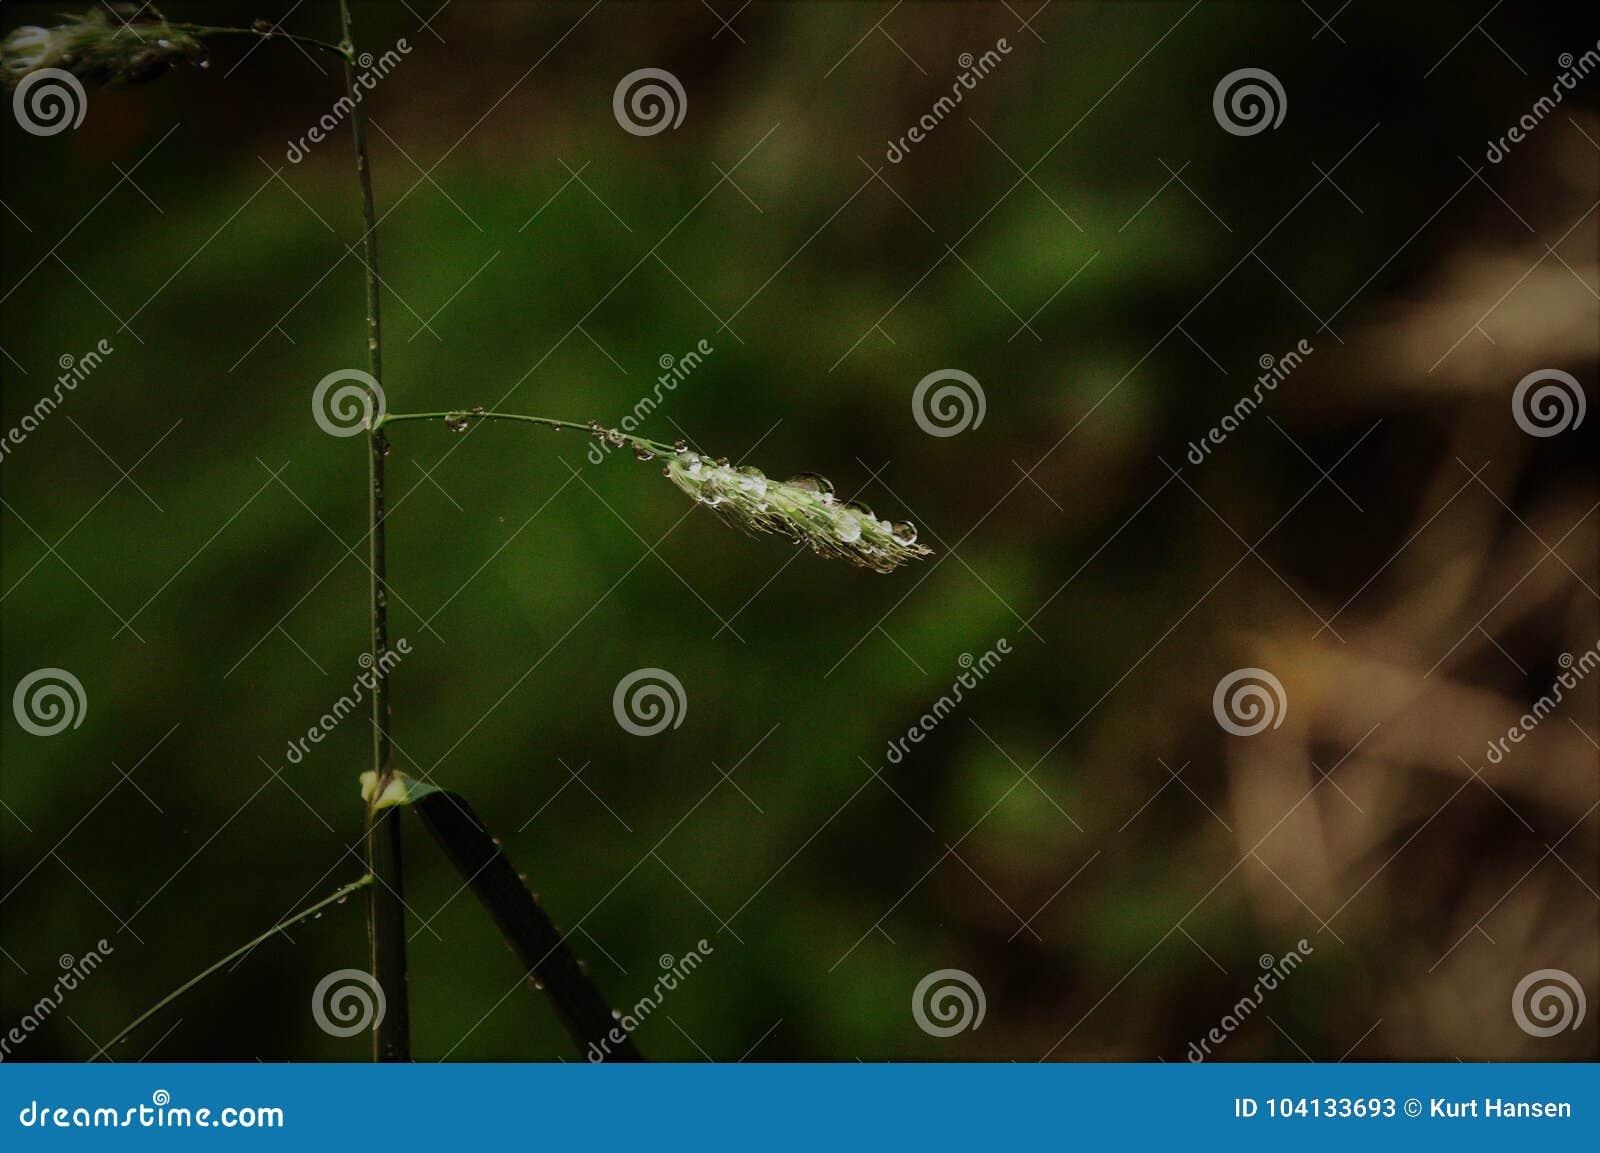 Grass whit rain